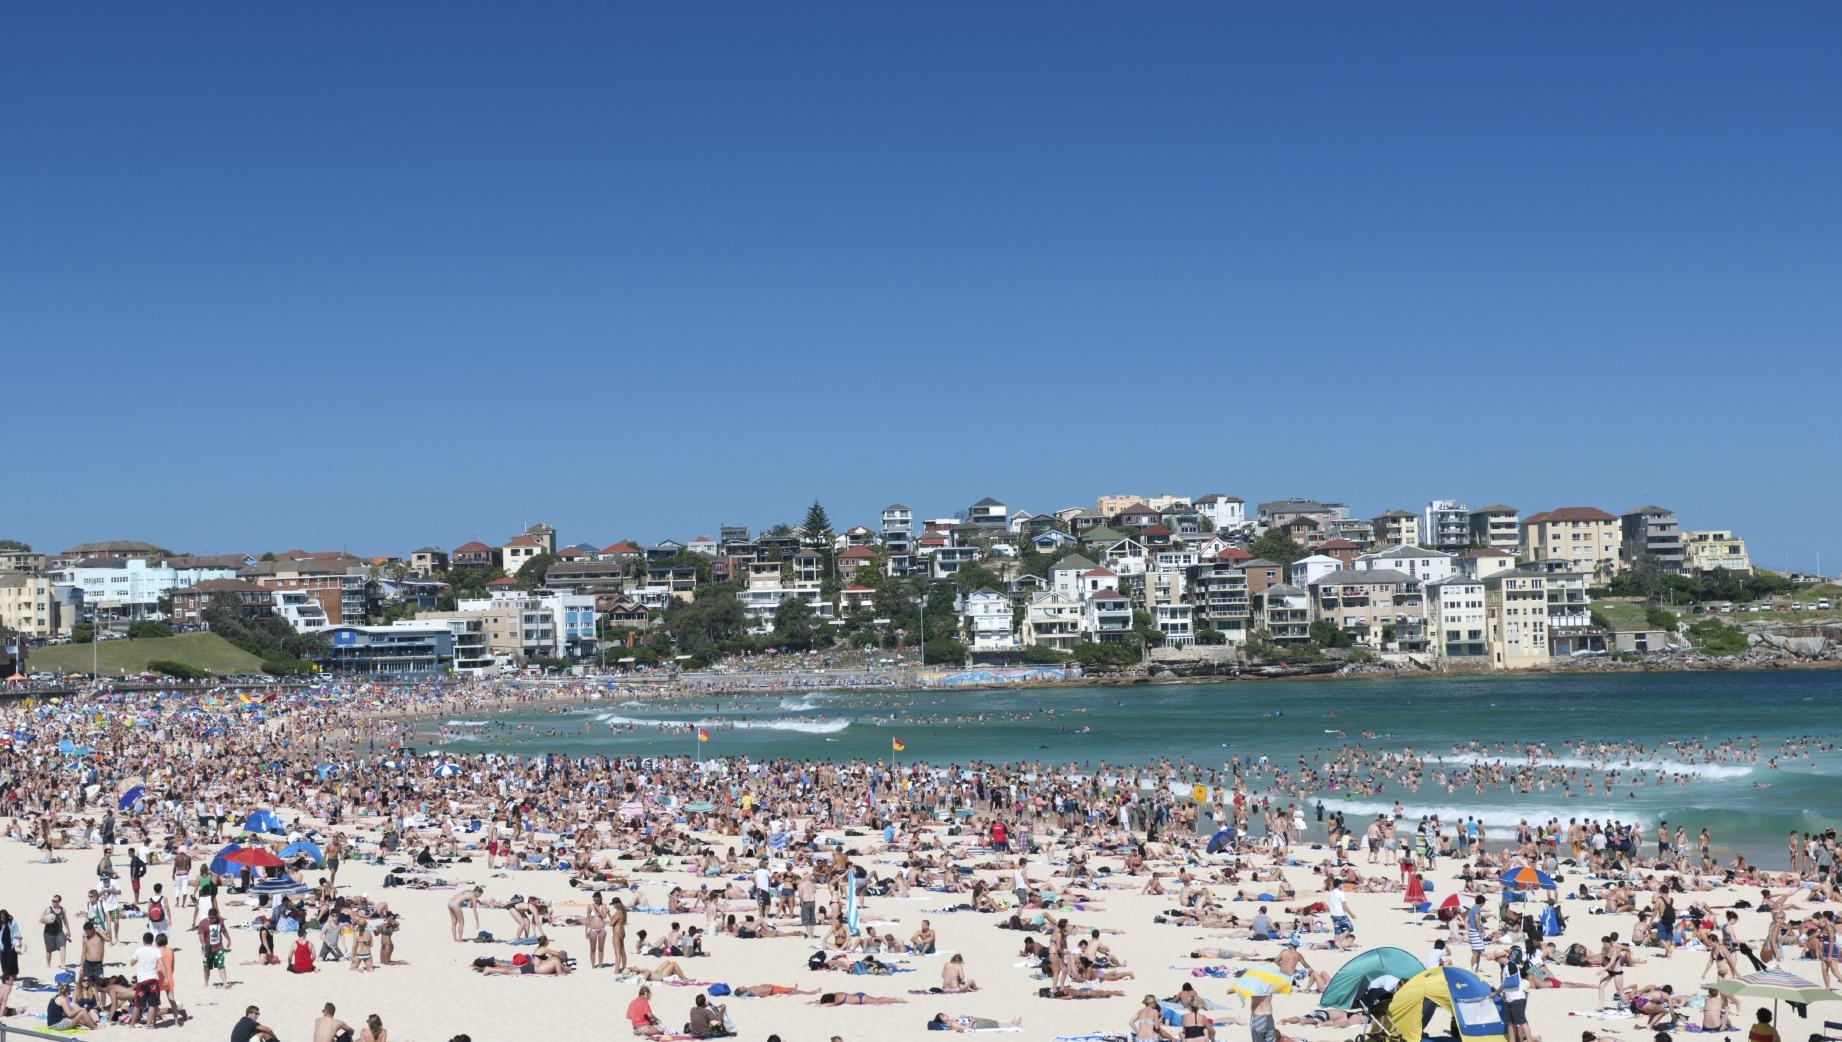 Beach Crowd iStock_000021032483Medium